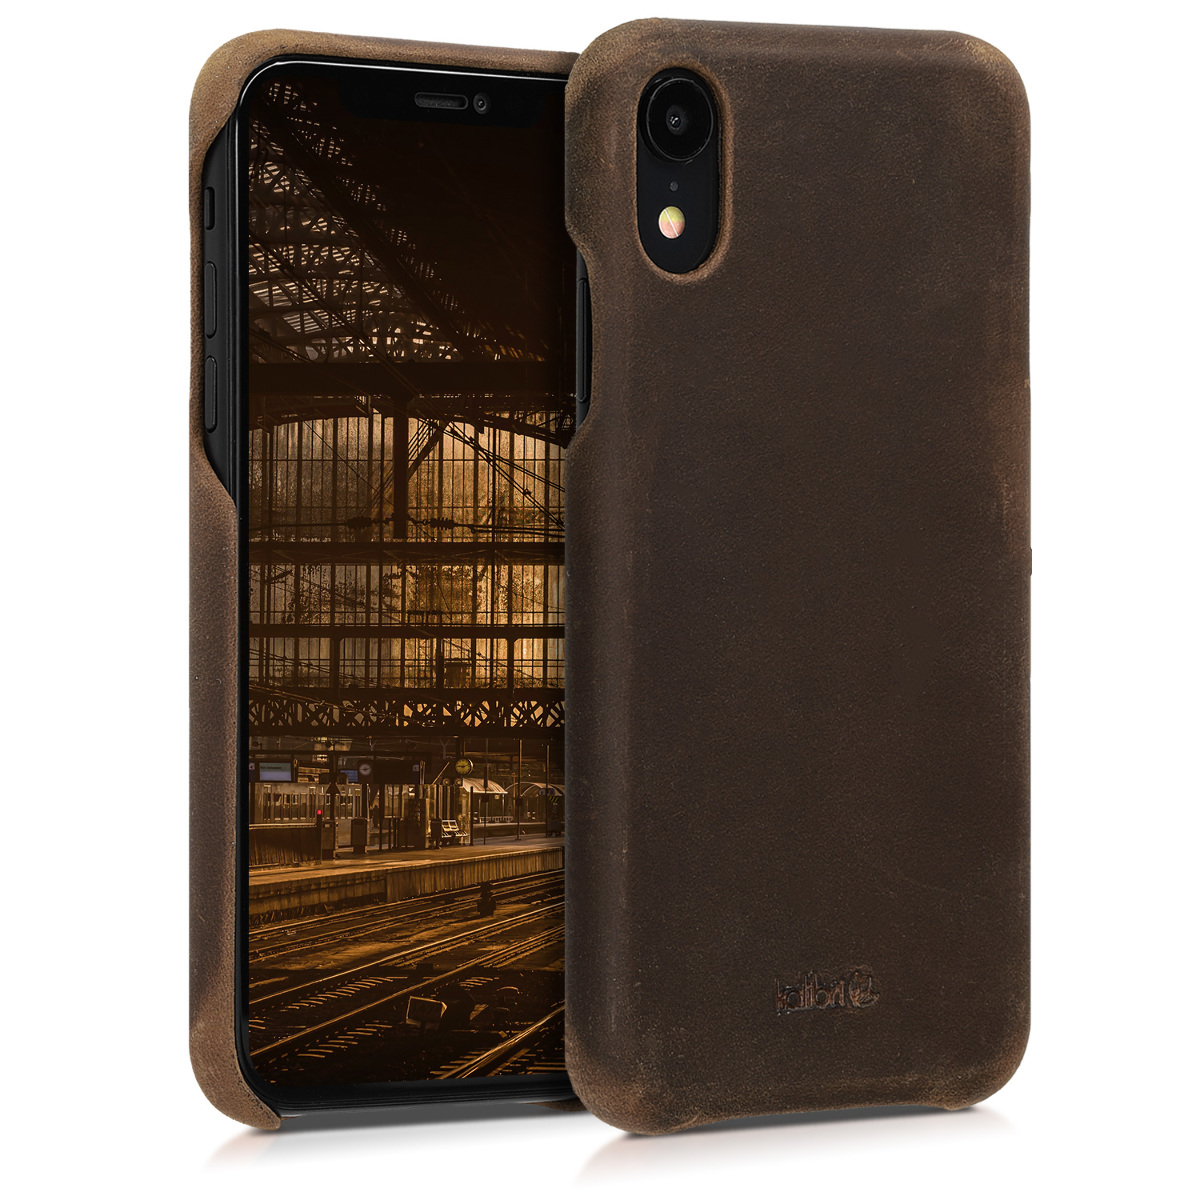 Kalibri Σκληρή Δερμάτινη Θήκη iPhone XR - Brown (45955.05)